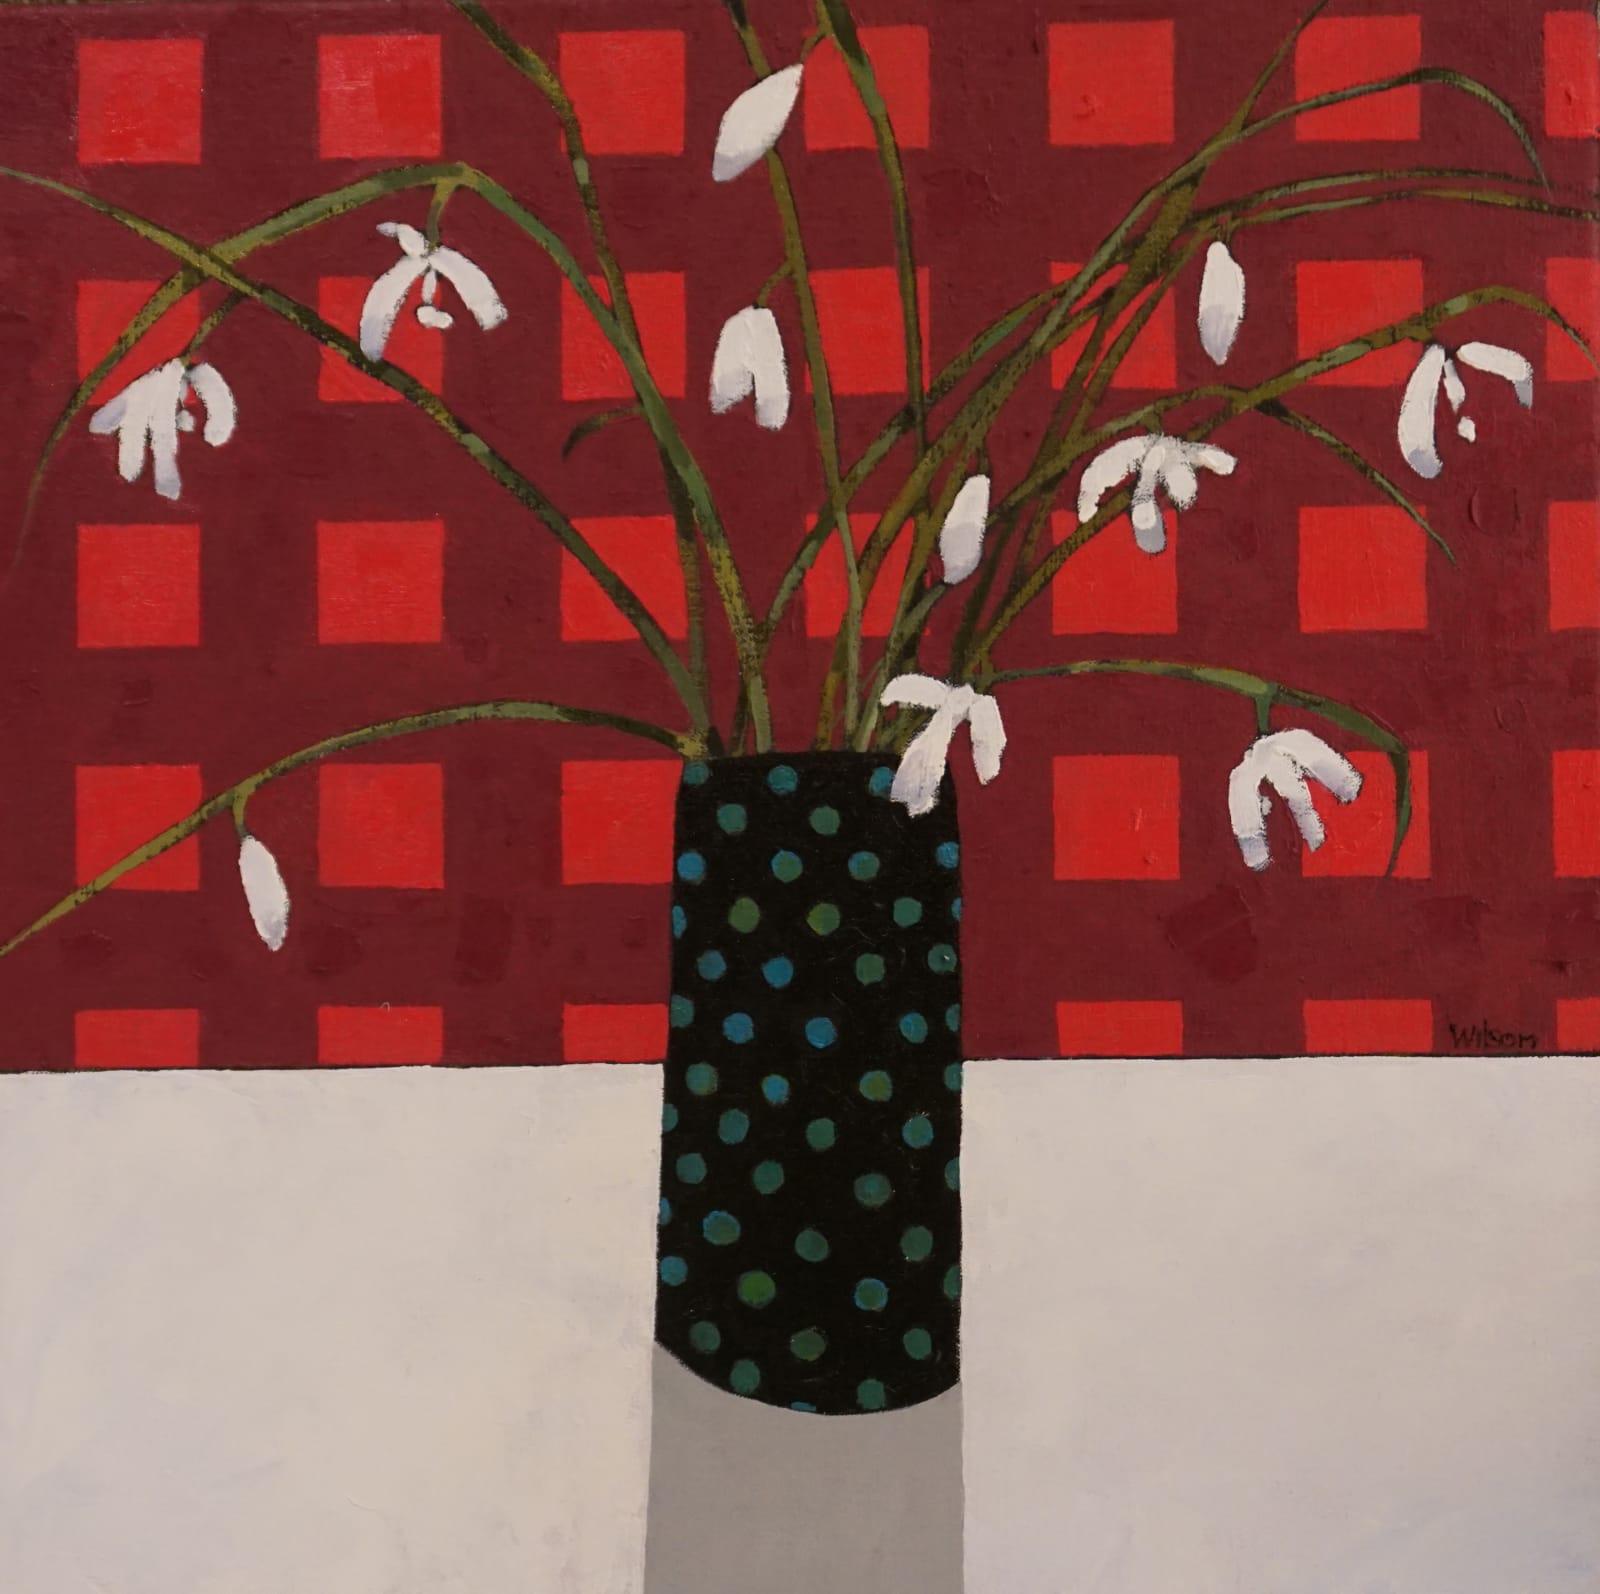 Gordon Wilson, Snowdrops and the Spotty Vase